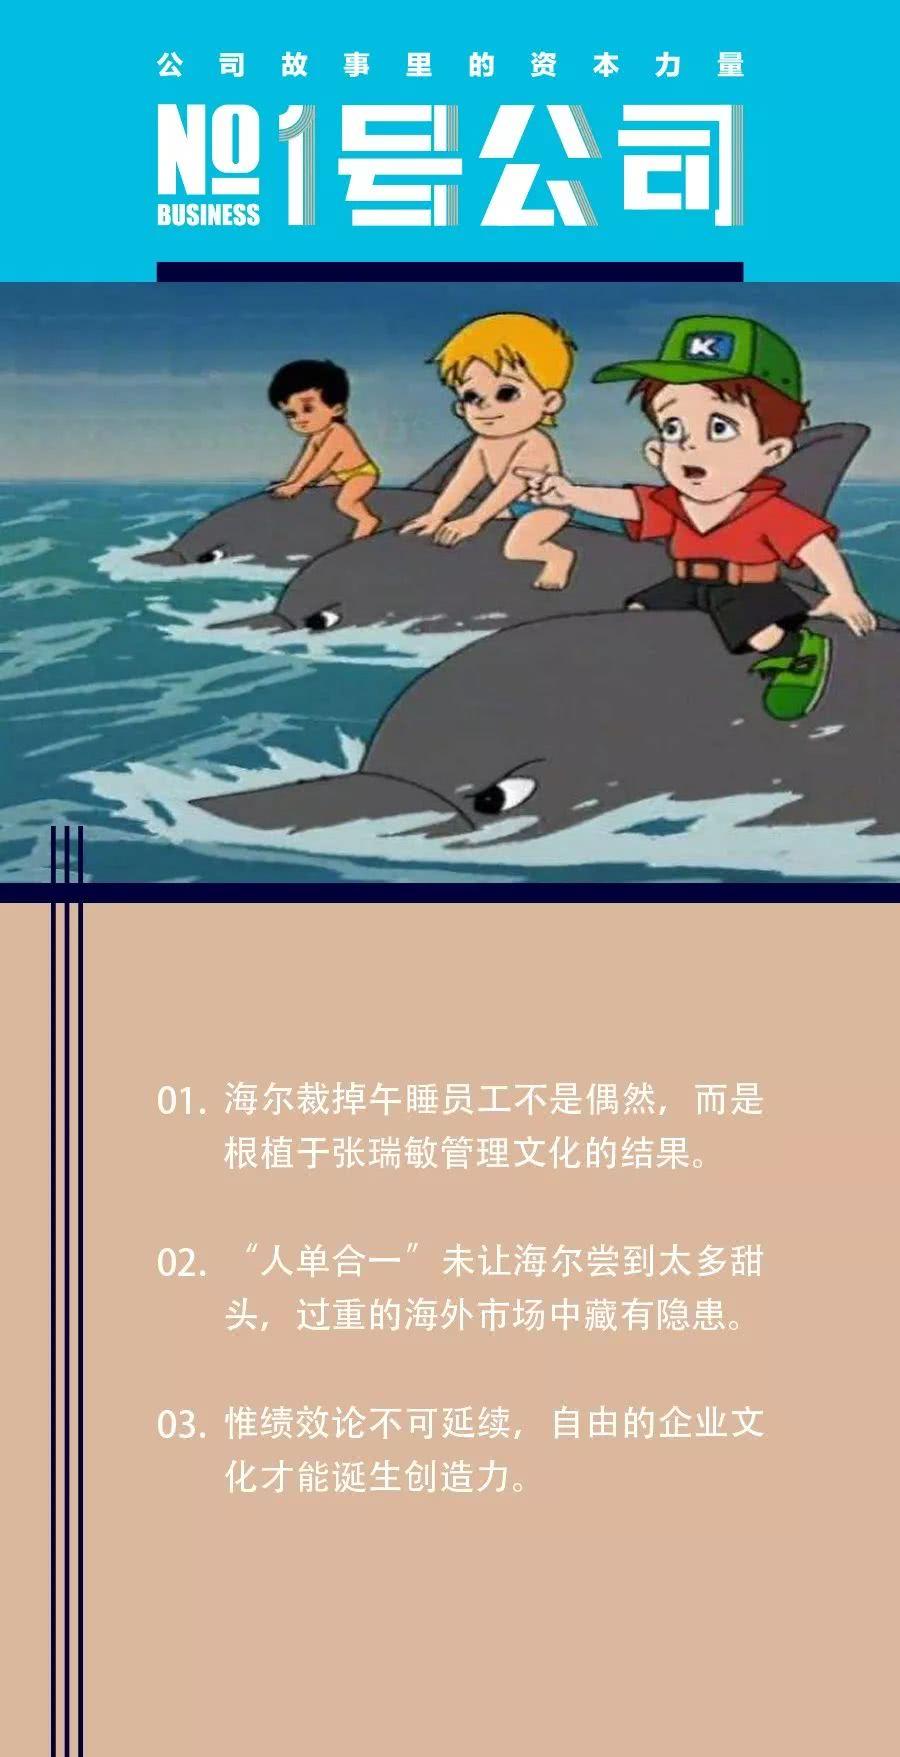 http://www.ysj98.com/shehui/1551445.html